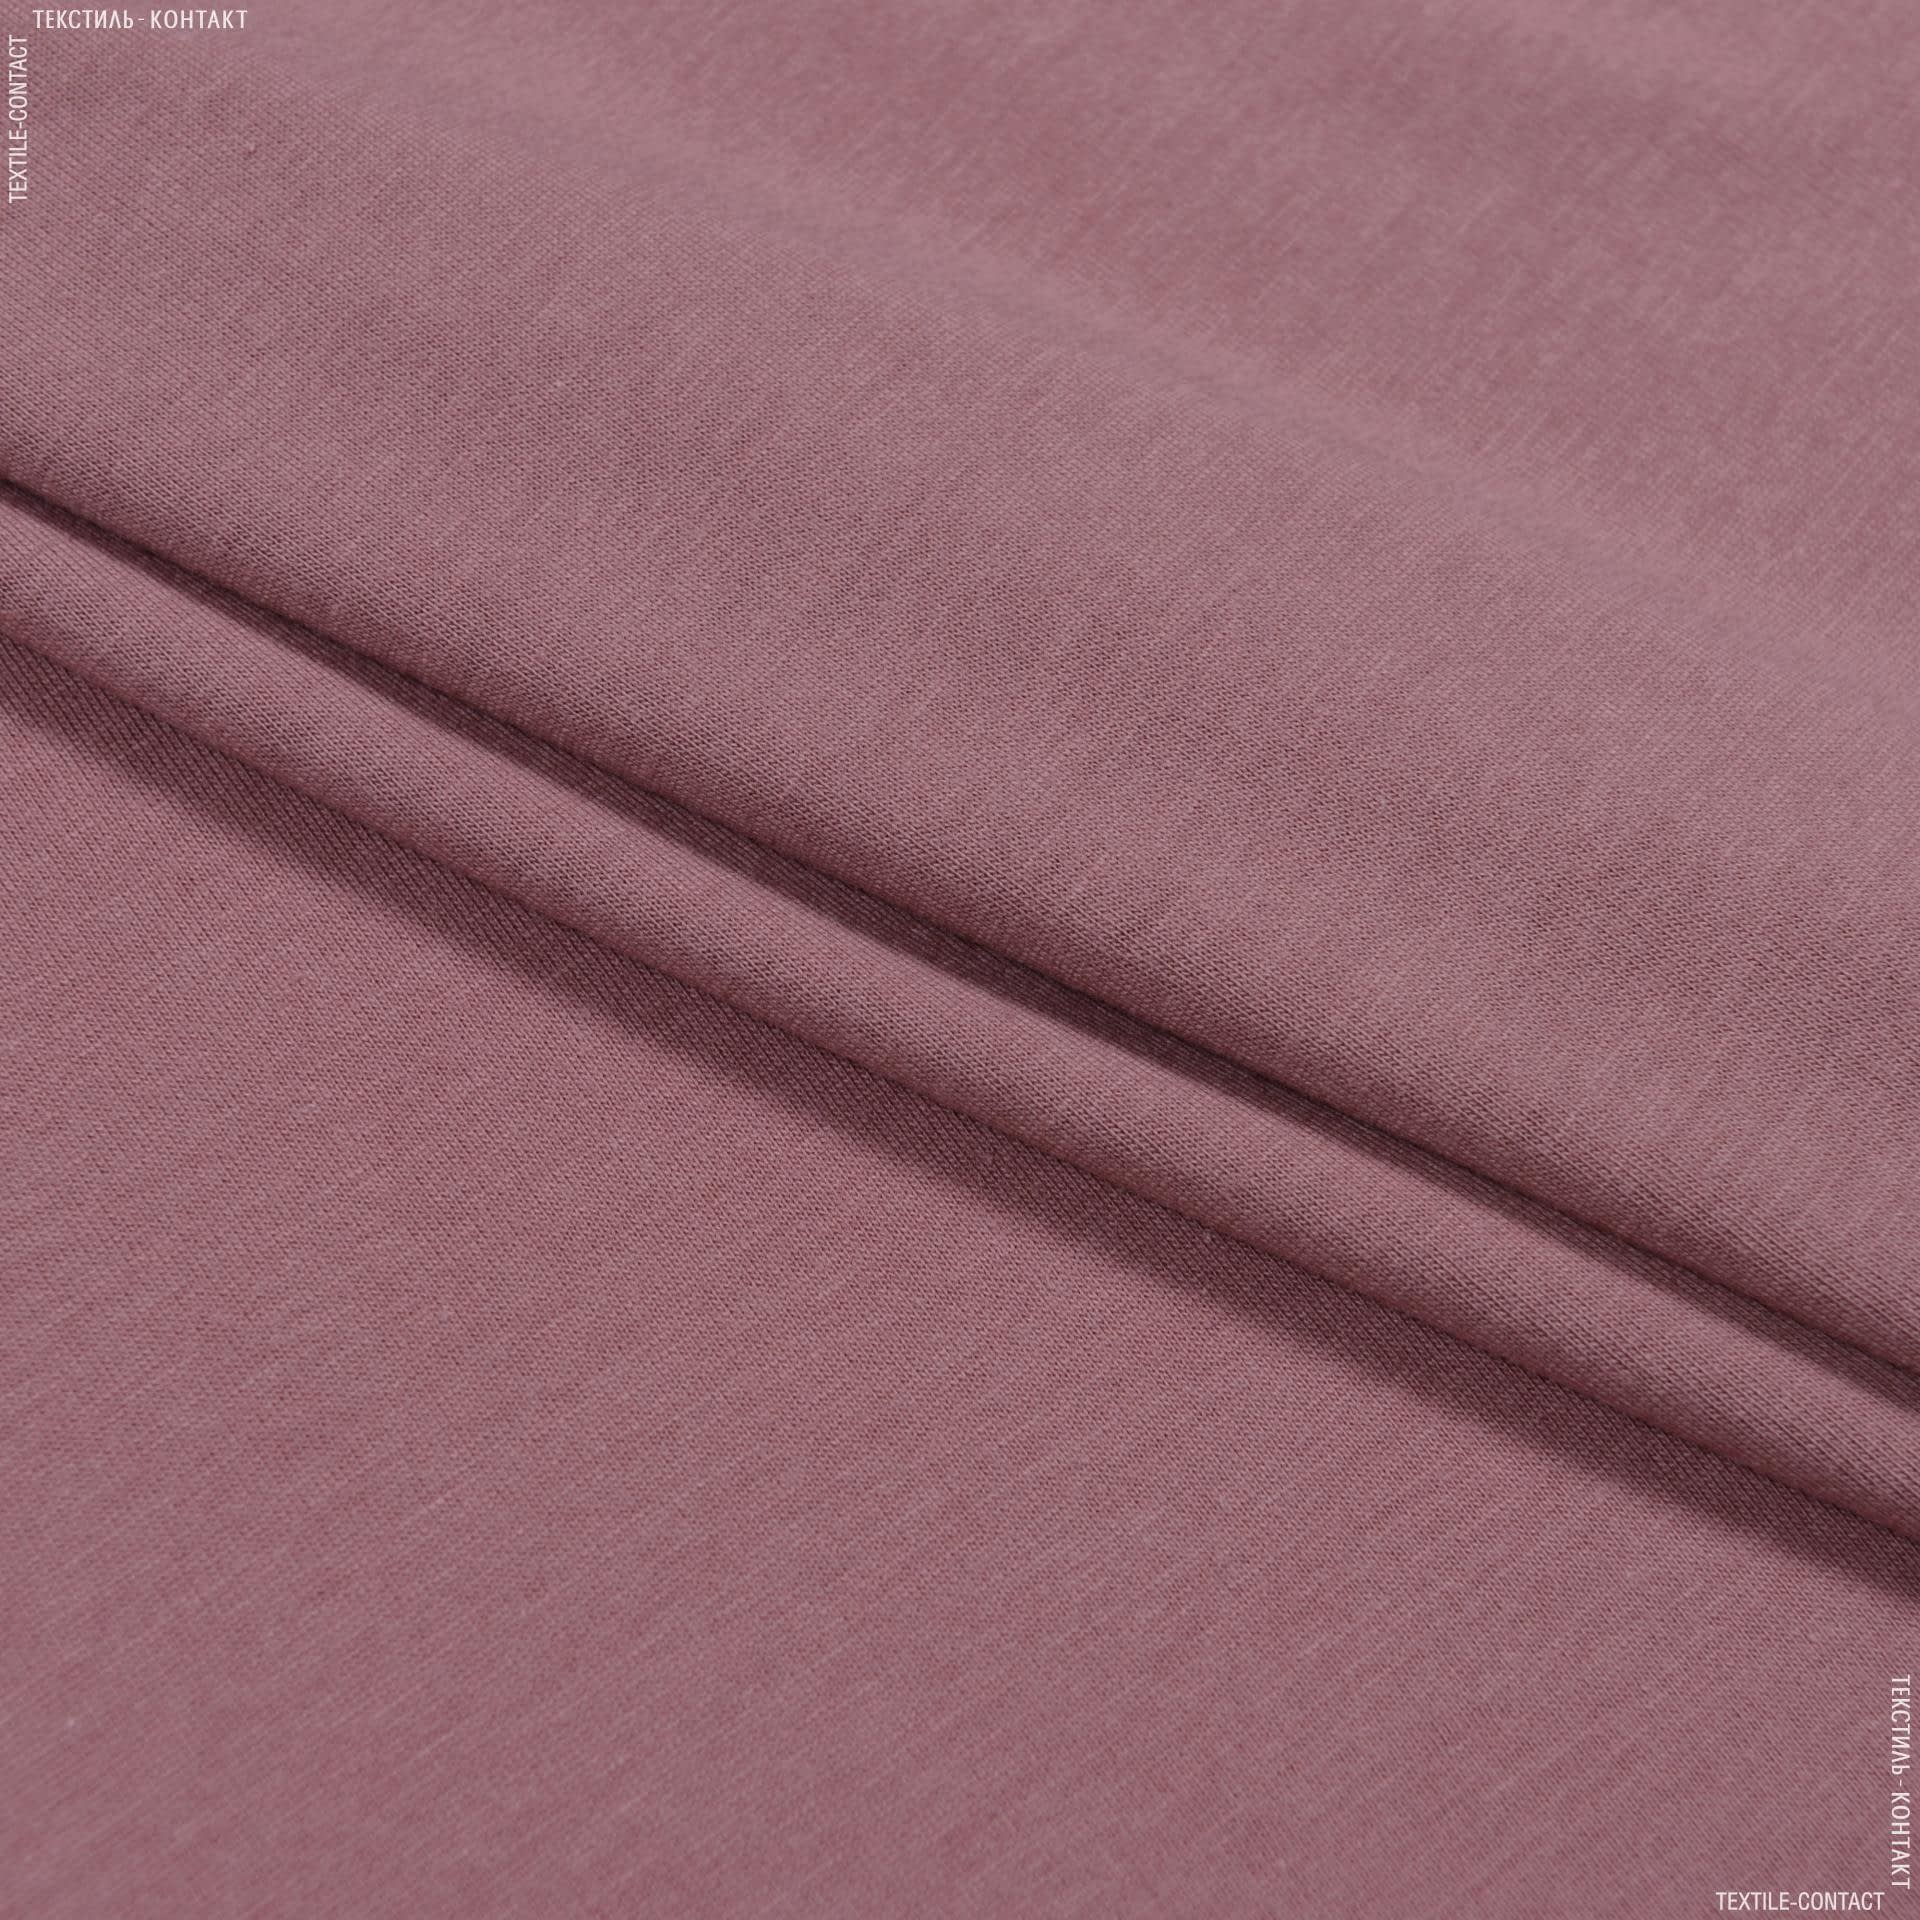 Ткани подкладочная ткань - Трикотаж подкладочный фрезово-бежевый